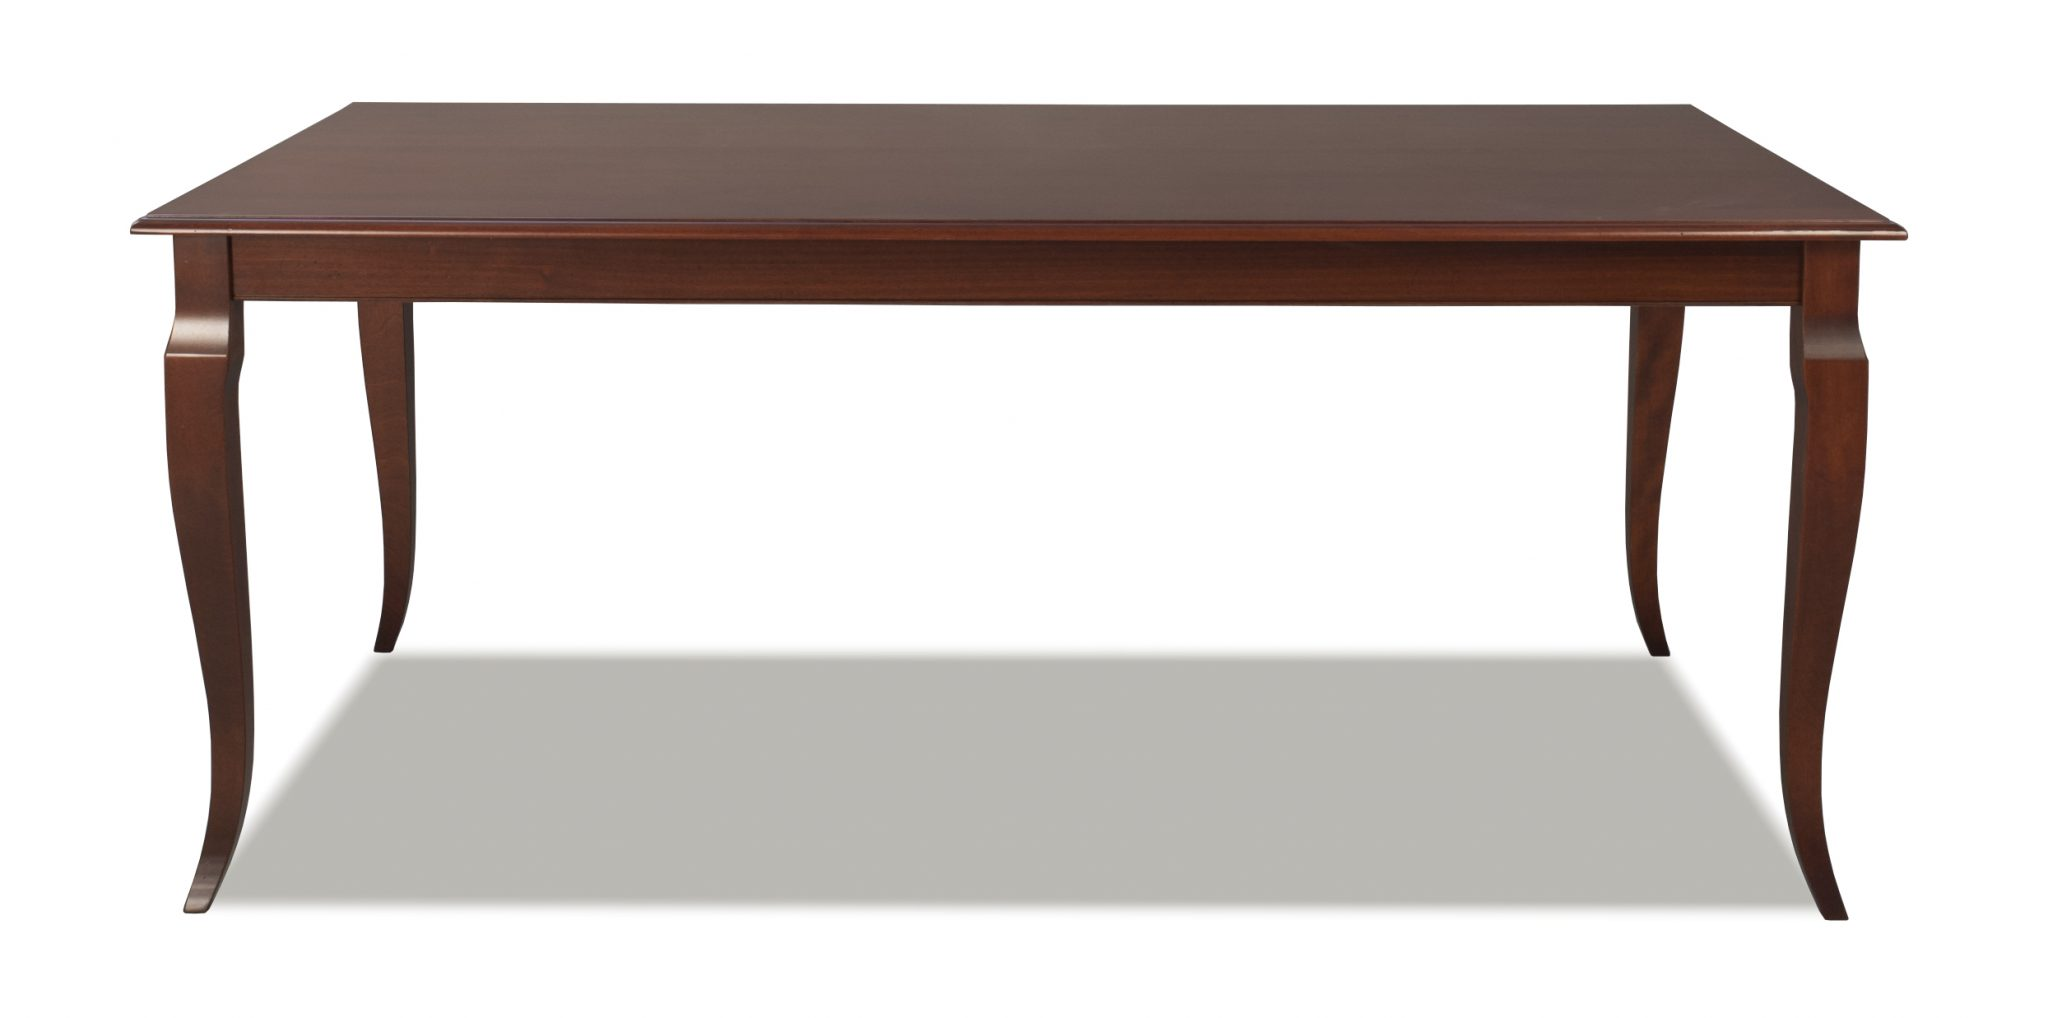 European Dining Table – Saloom Furniture Company